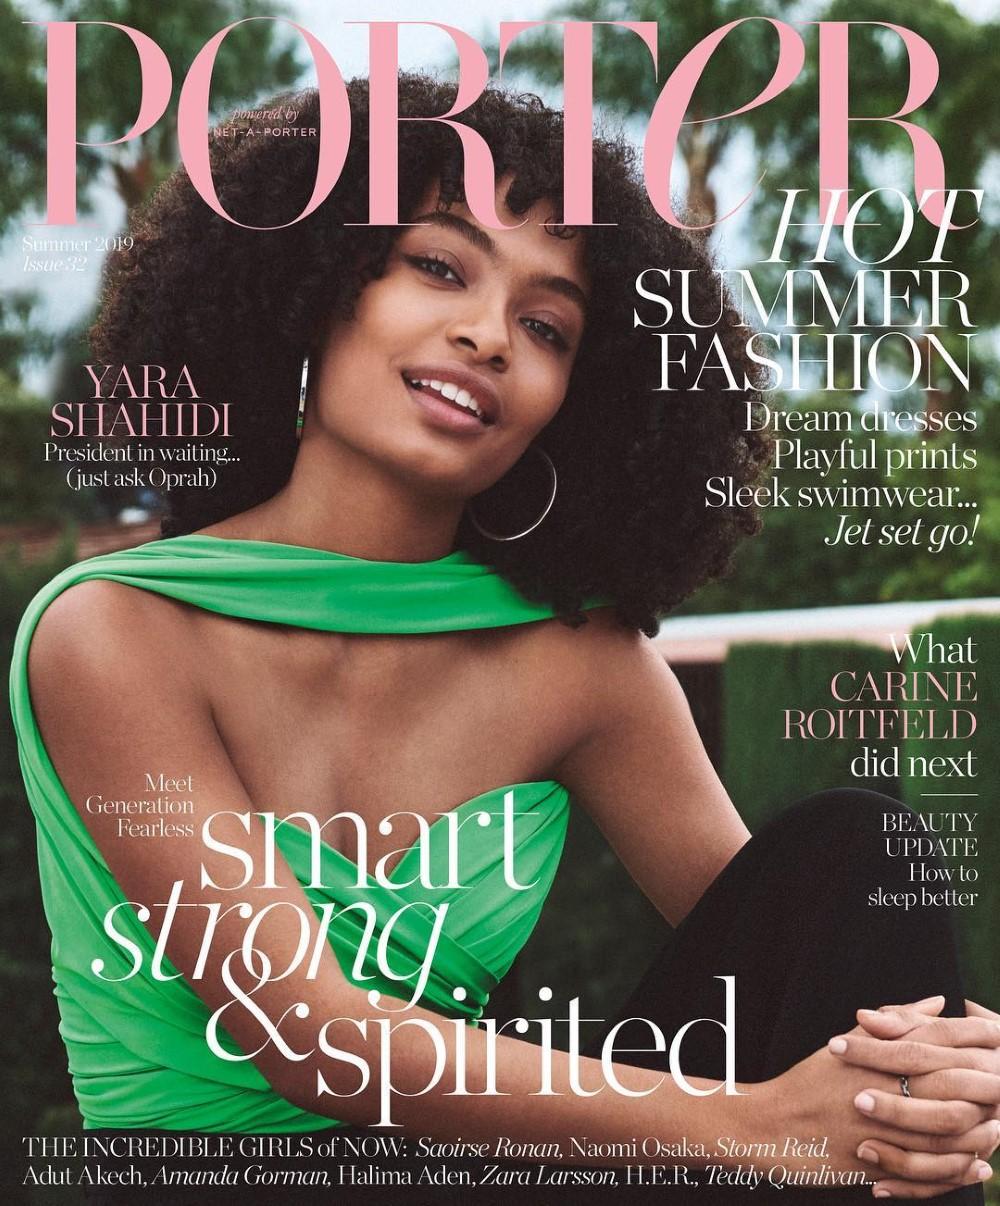 Yara-Shahidi-Cass-Bird-Porter-Magazine-Summer-2019- (1).jpg